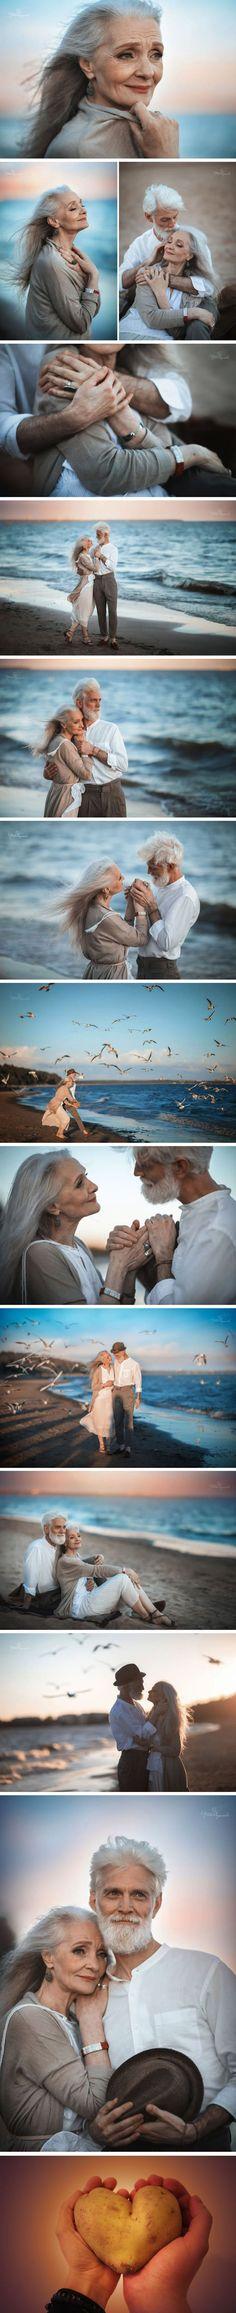 Photographer Captures Elderly Couple's Precious Moment To Show Eternal Love